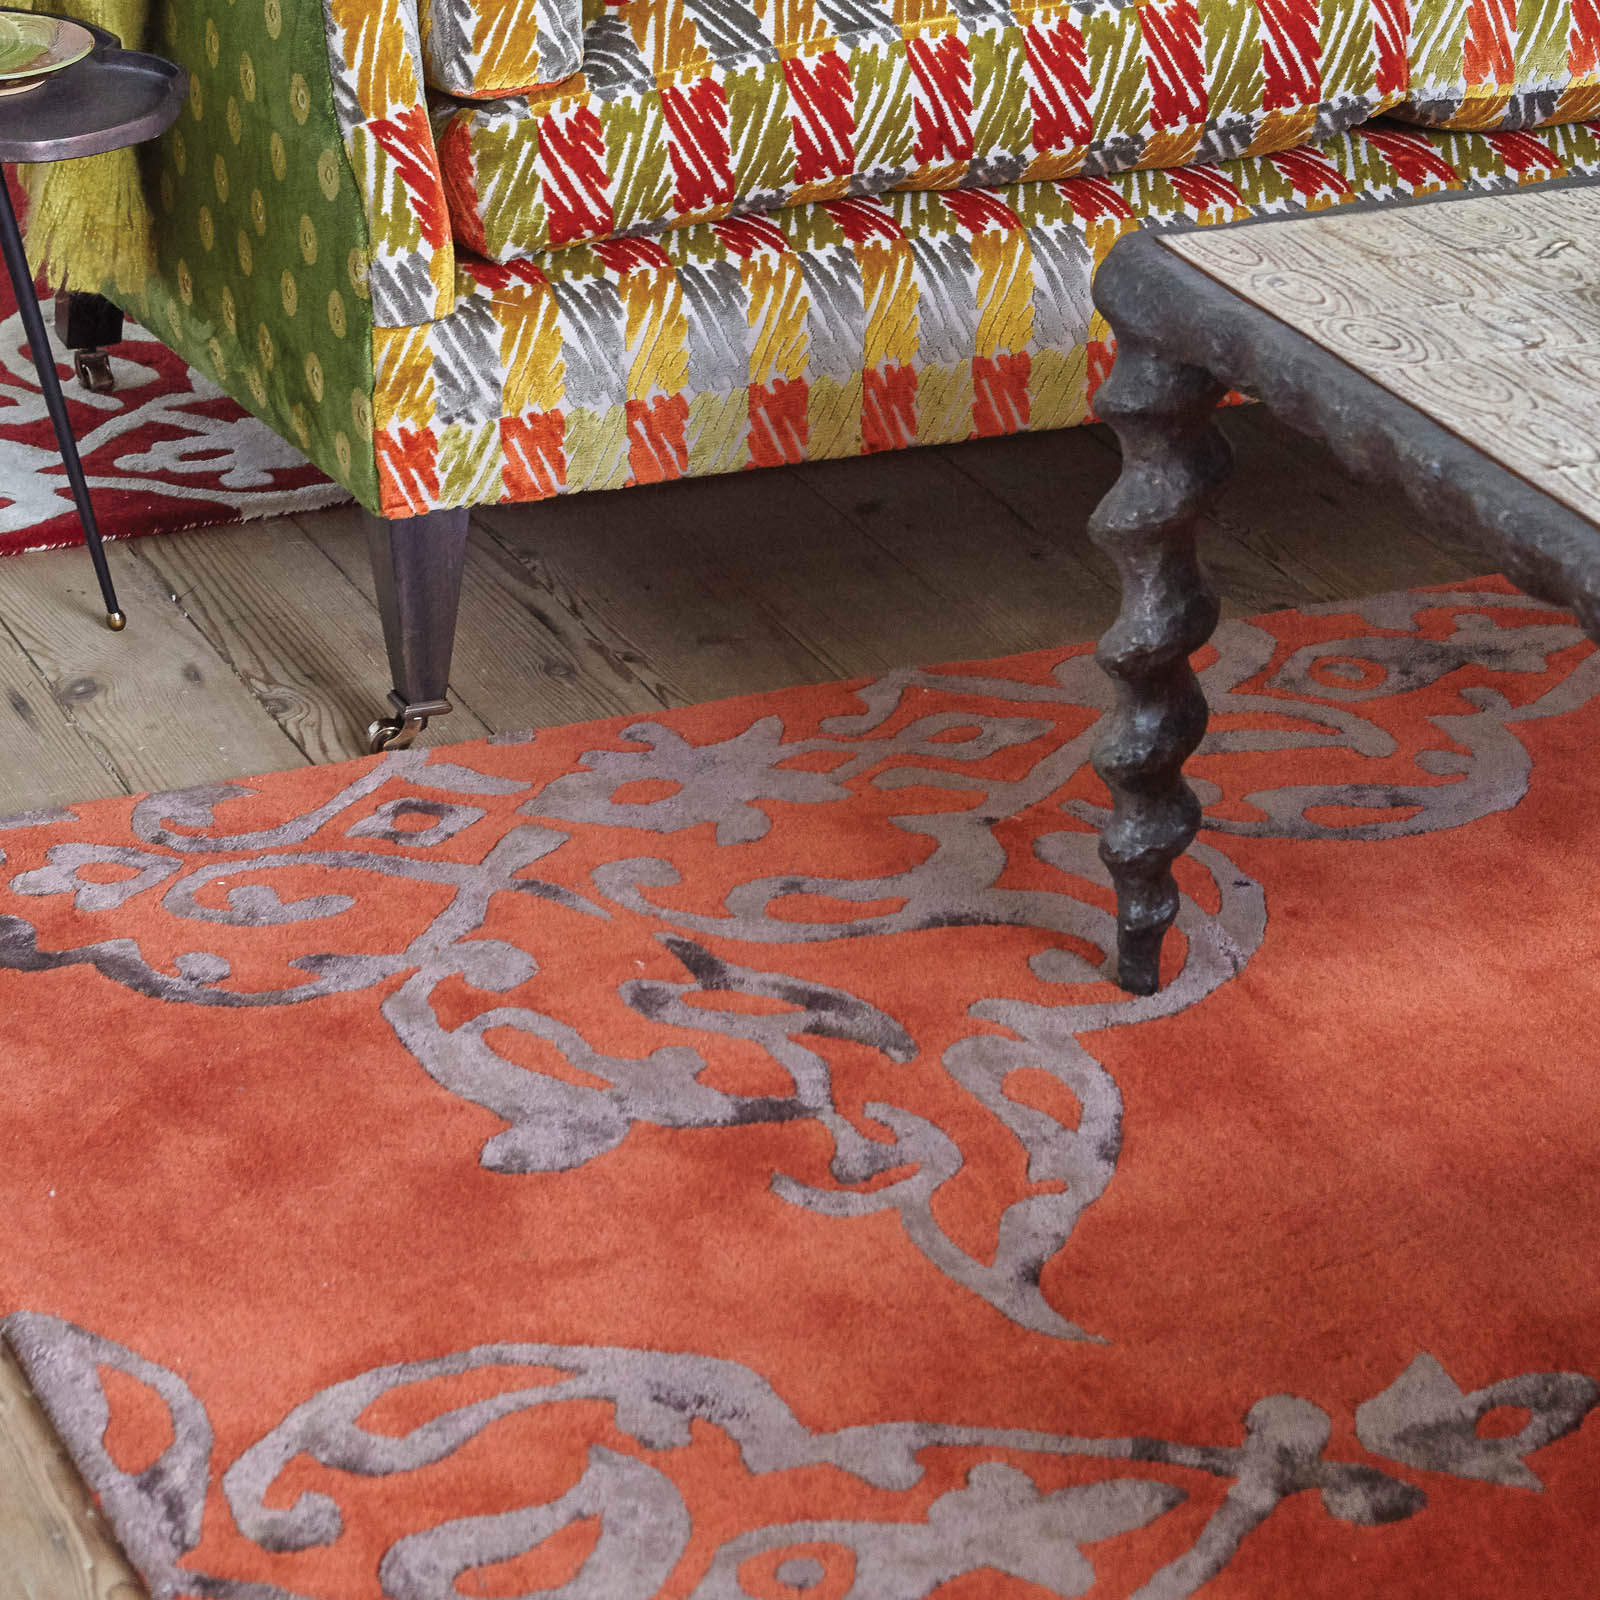 Carlotta rugs in Clemenine by William Yeoward